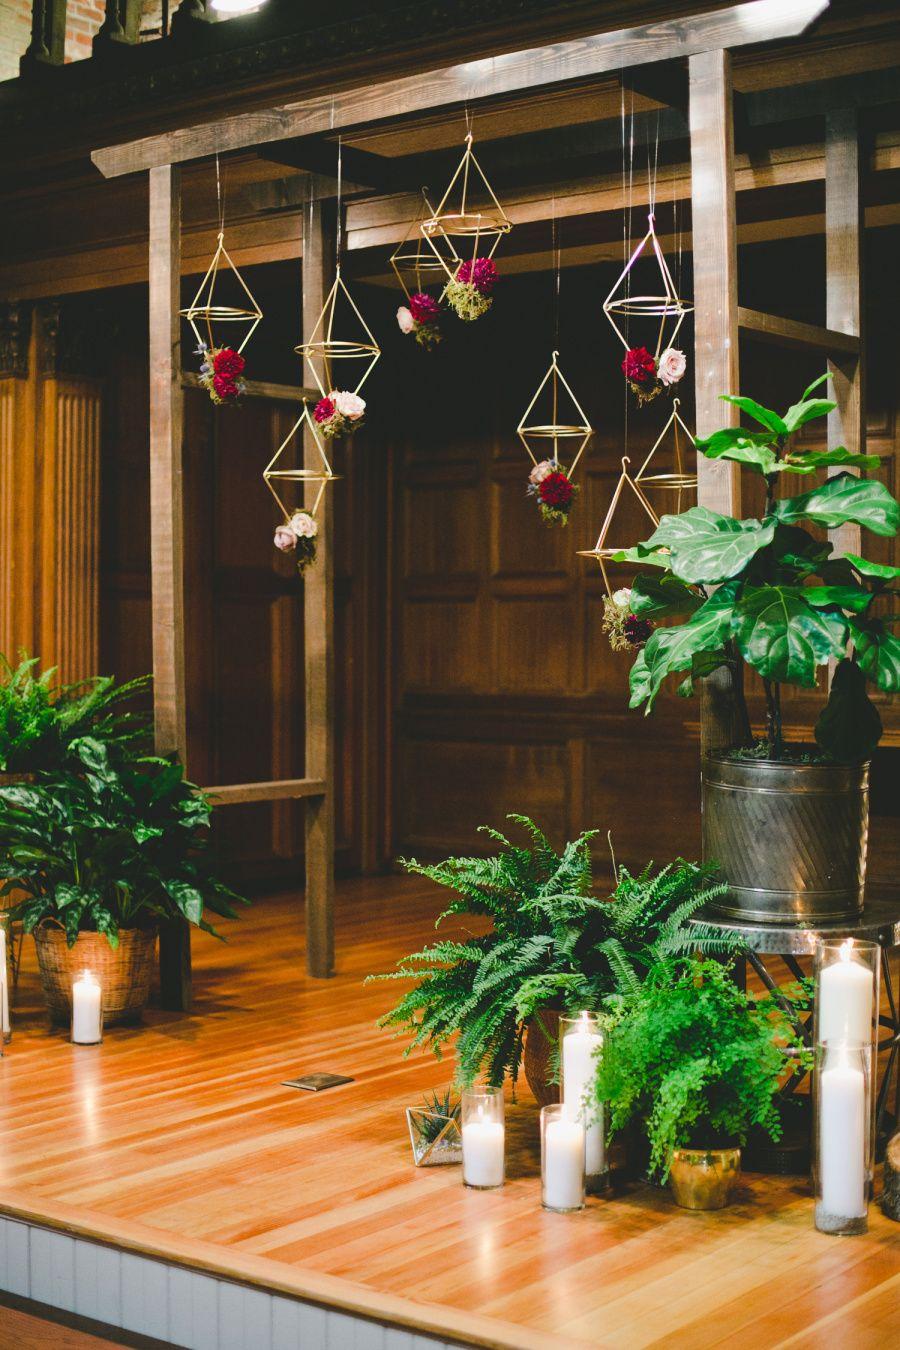 Mod Geometric Rustic Wedding At The Loft On Pine Rustic Style Wedding Unique Rustic Wedding Rustic Wedding Decor